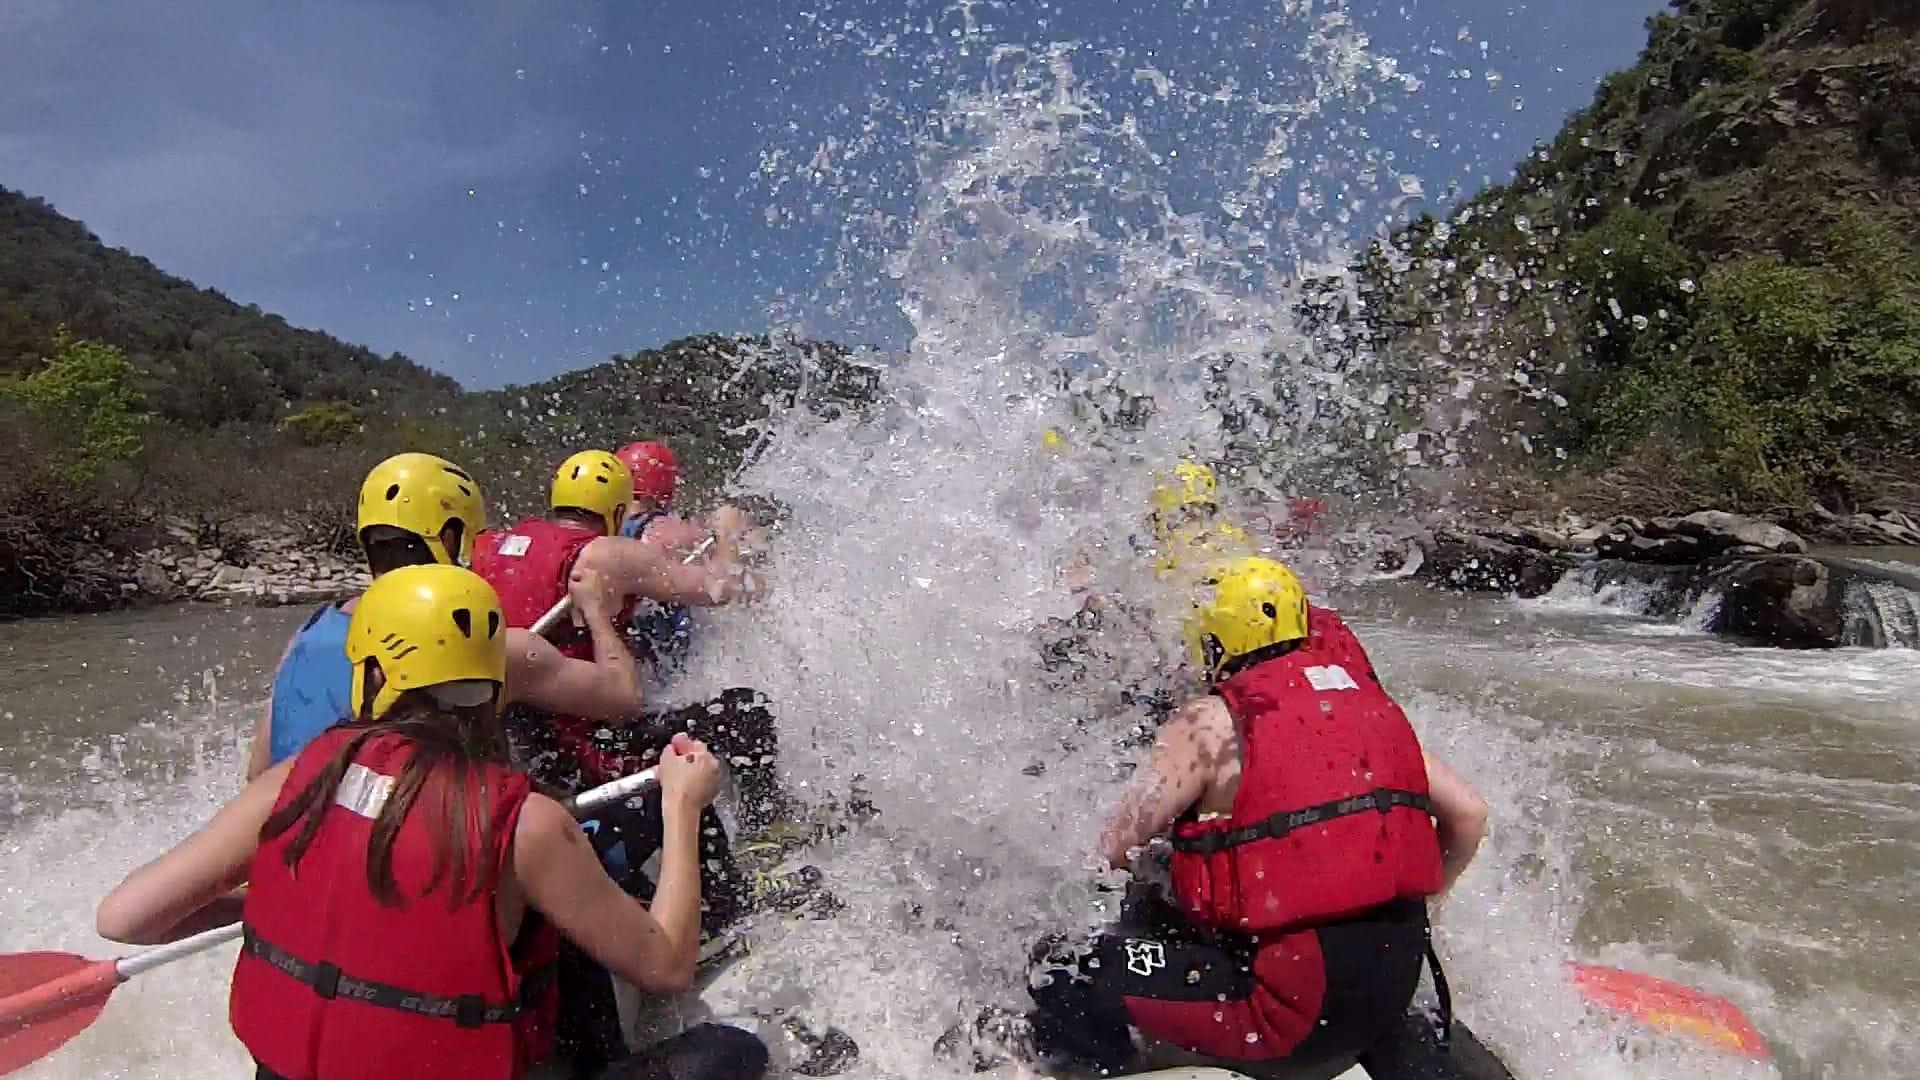 Rafting στον ποταμό Πηνειό μέσω της οργάνωσης Trekking Hellas